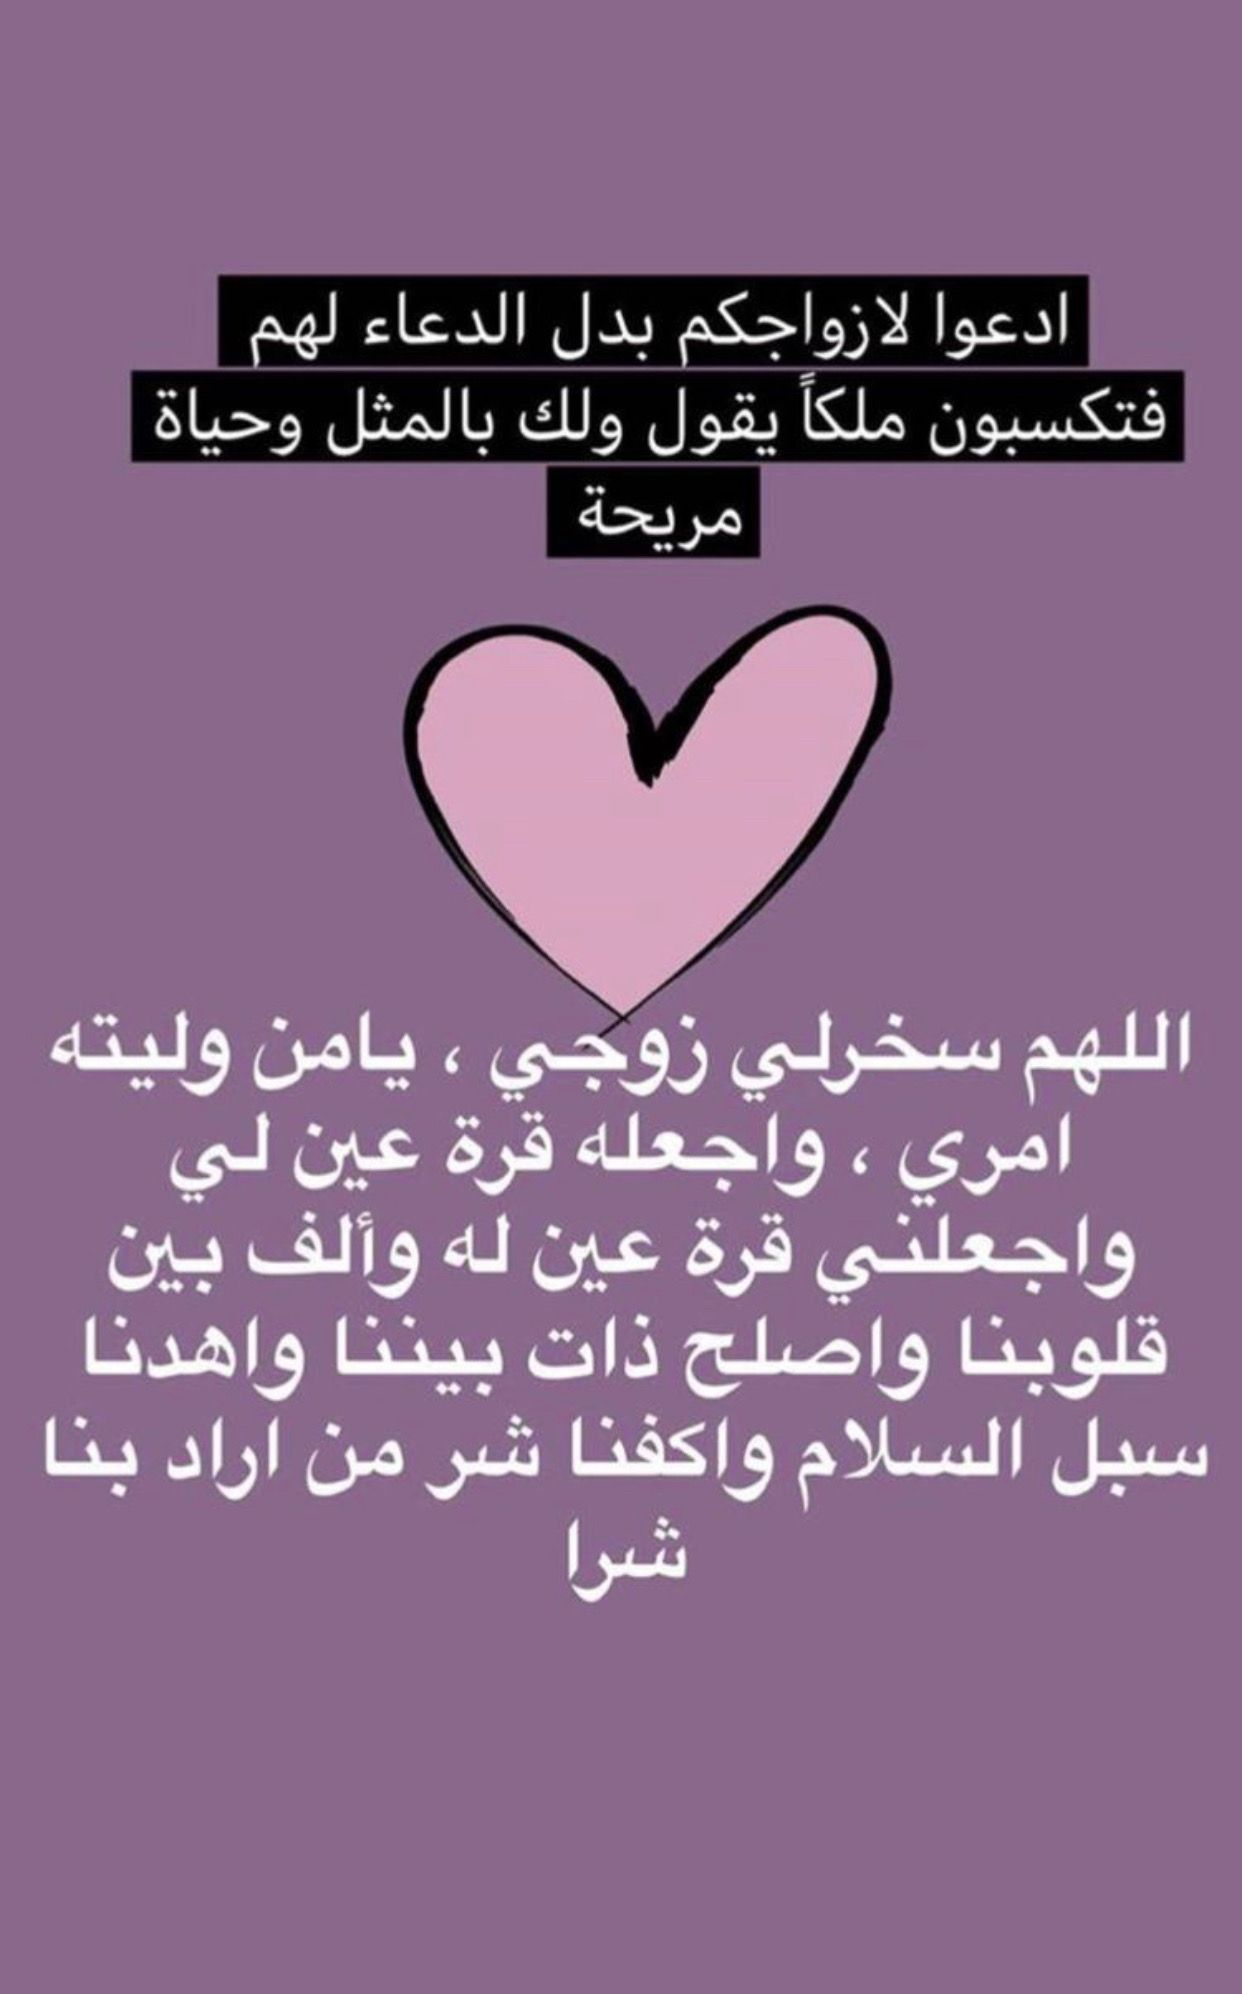 اللهم آميييييين Islam Facts Photo Quotes Quran Quotes